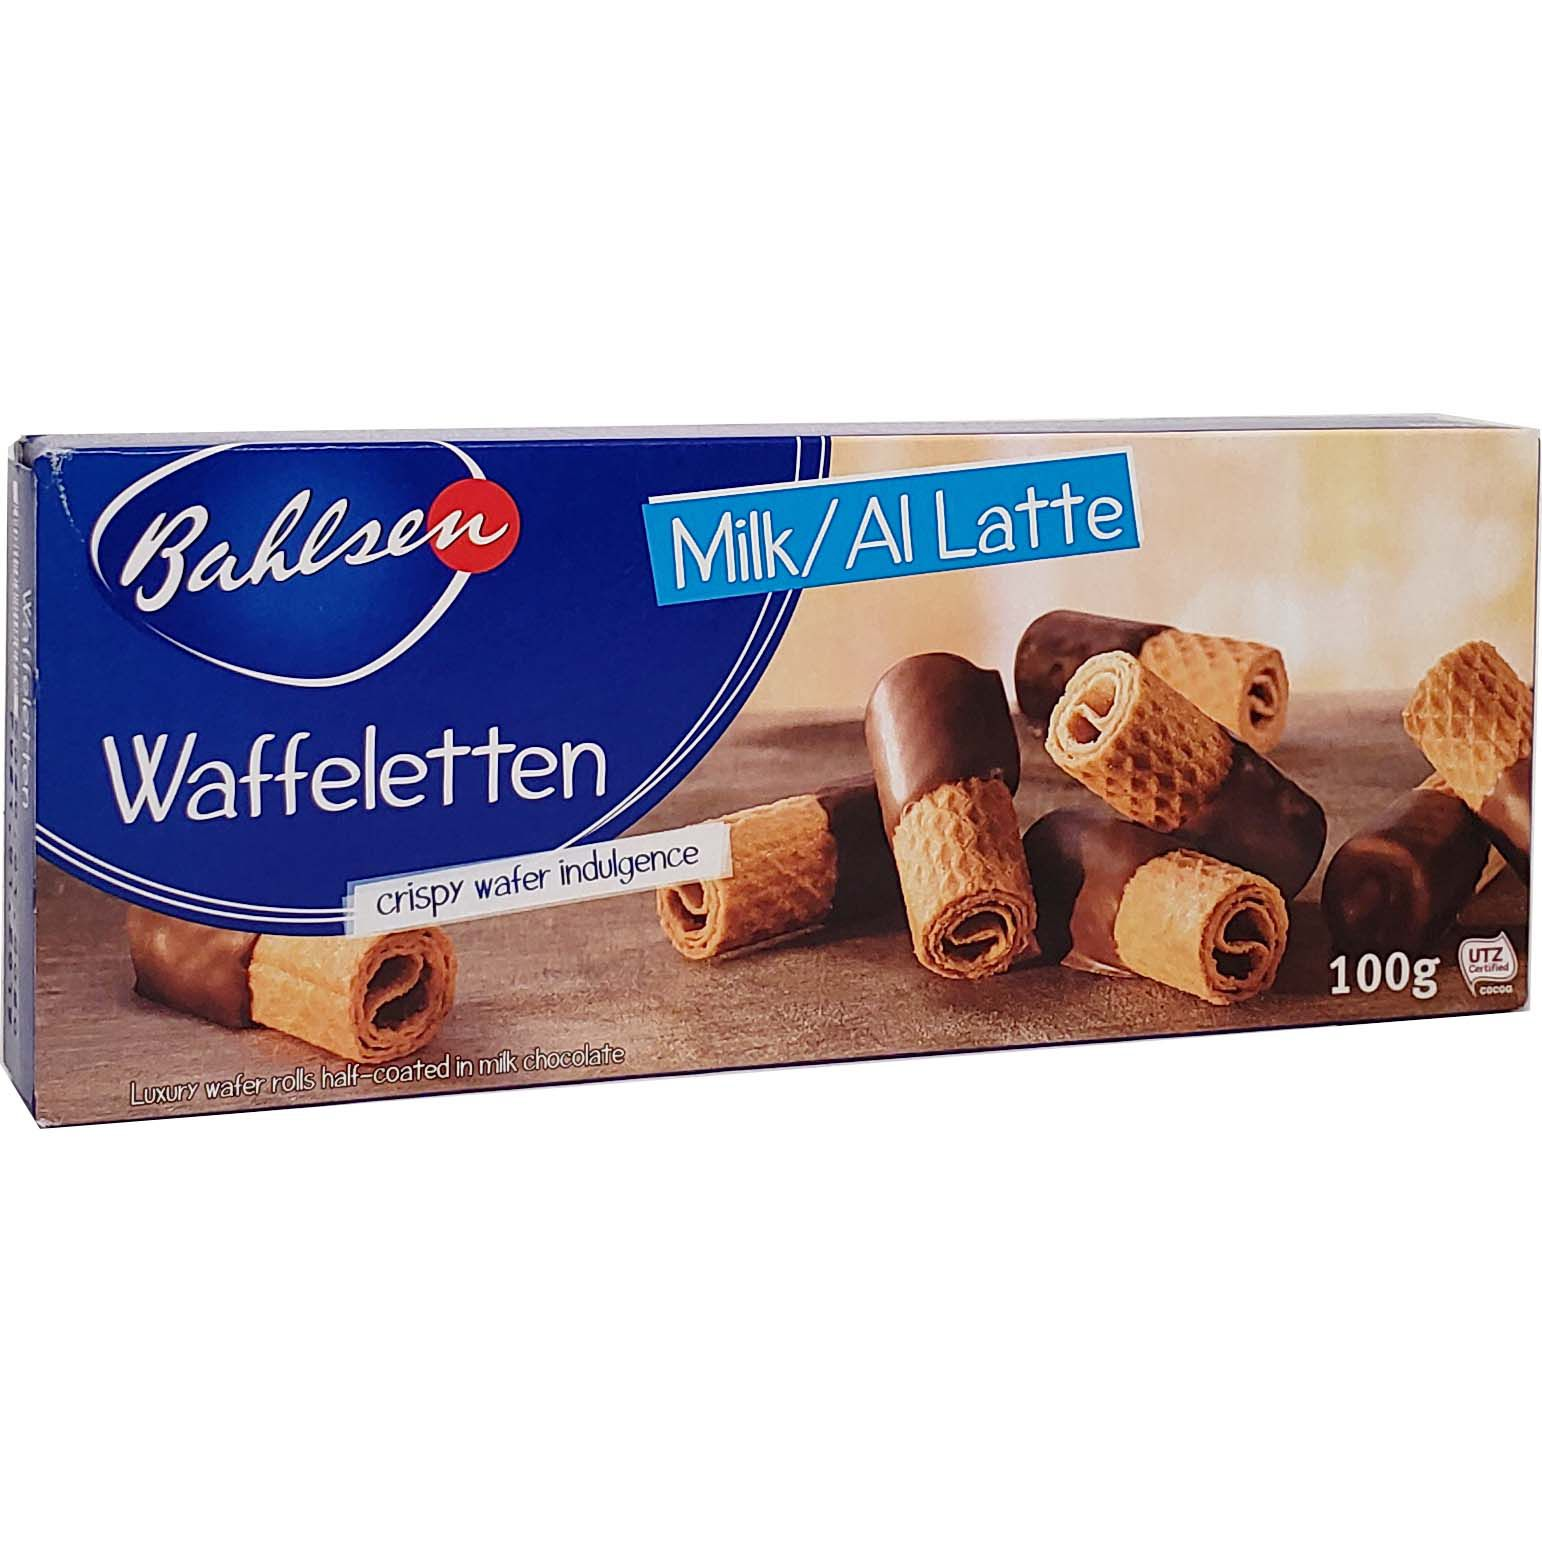 Biscoito Bahlsen Waffeletten Milk - 100g -